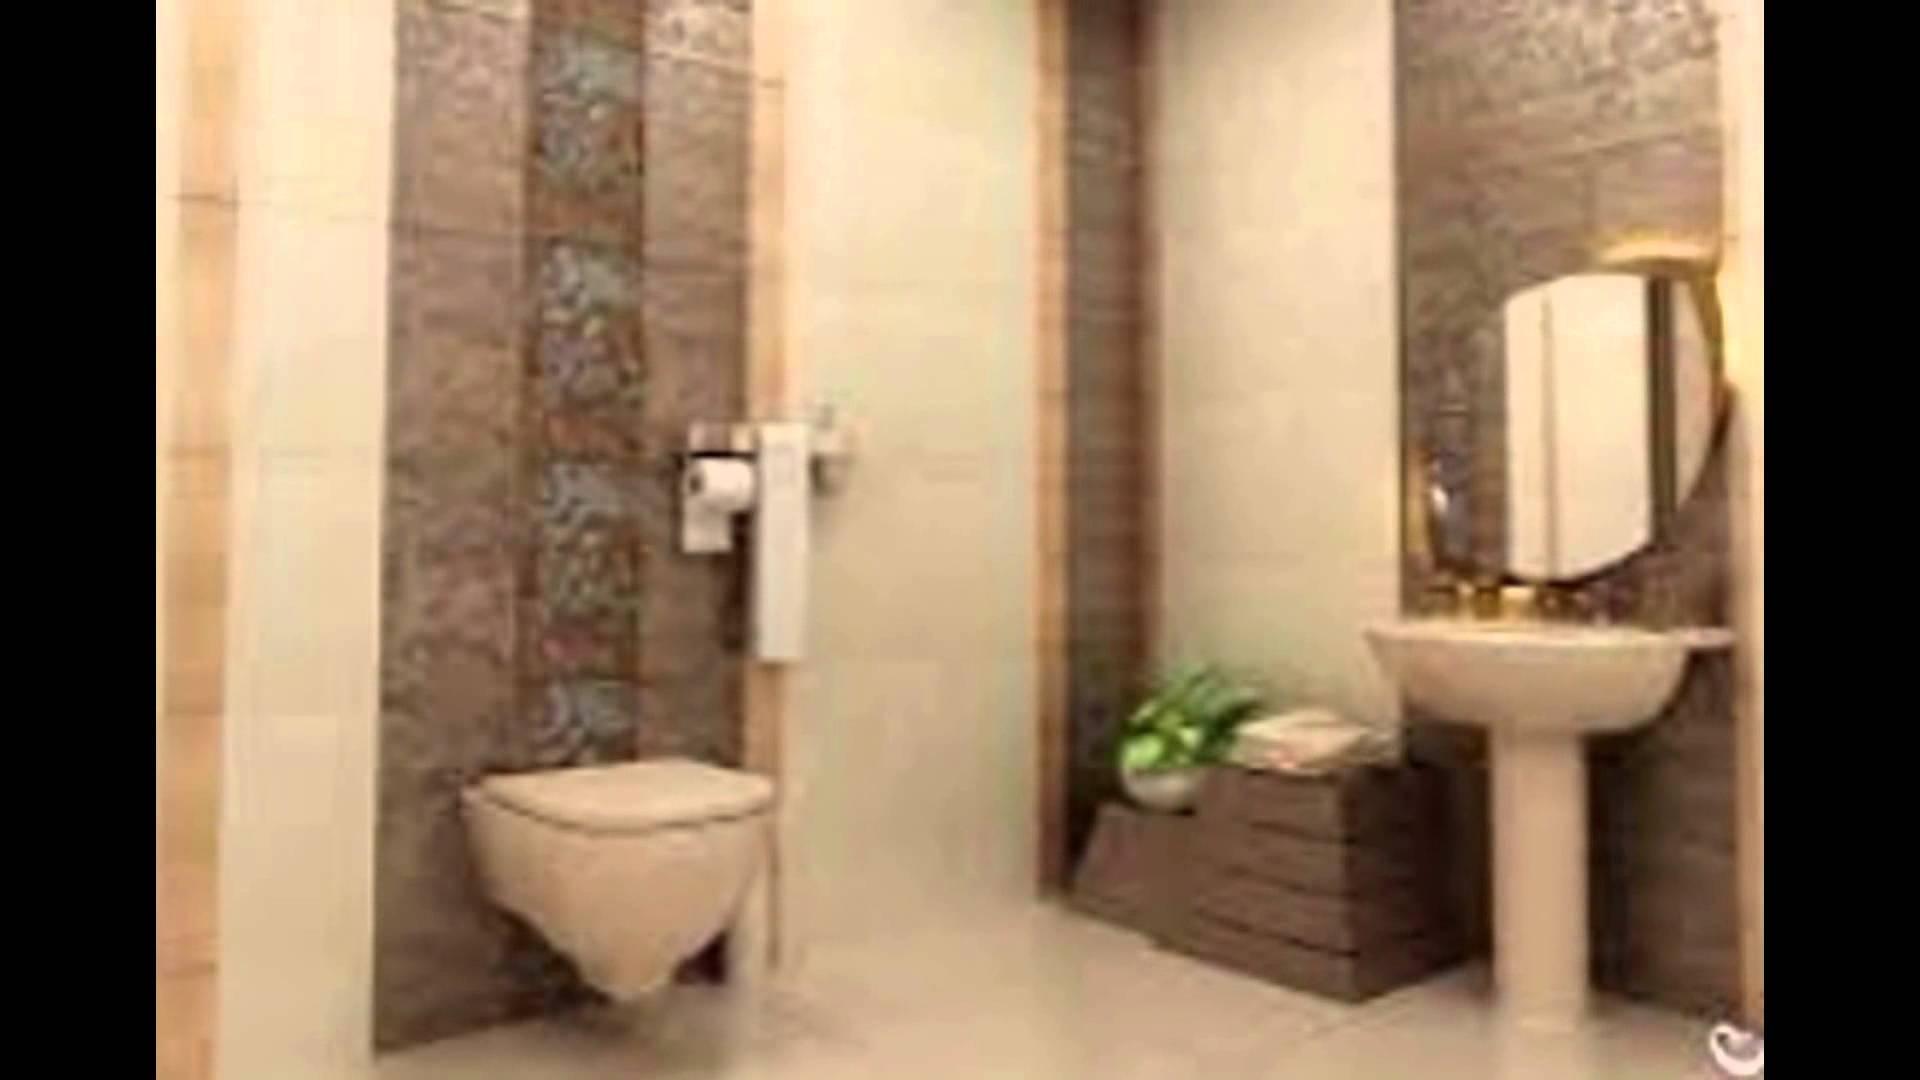 بالصور ديكور حمامات سيراميك , افخم صور ديكورات سيراميك الحمامات 4394 2